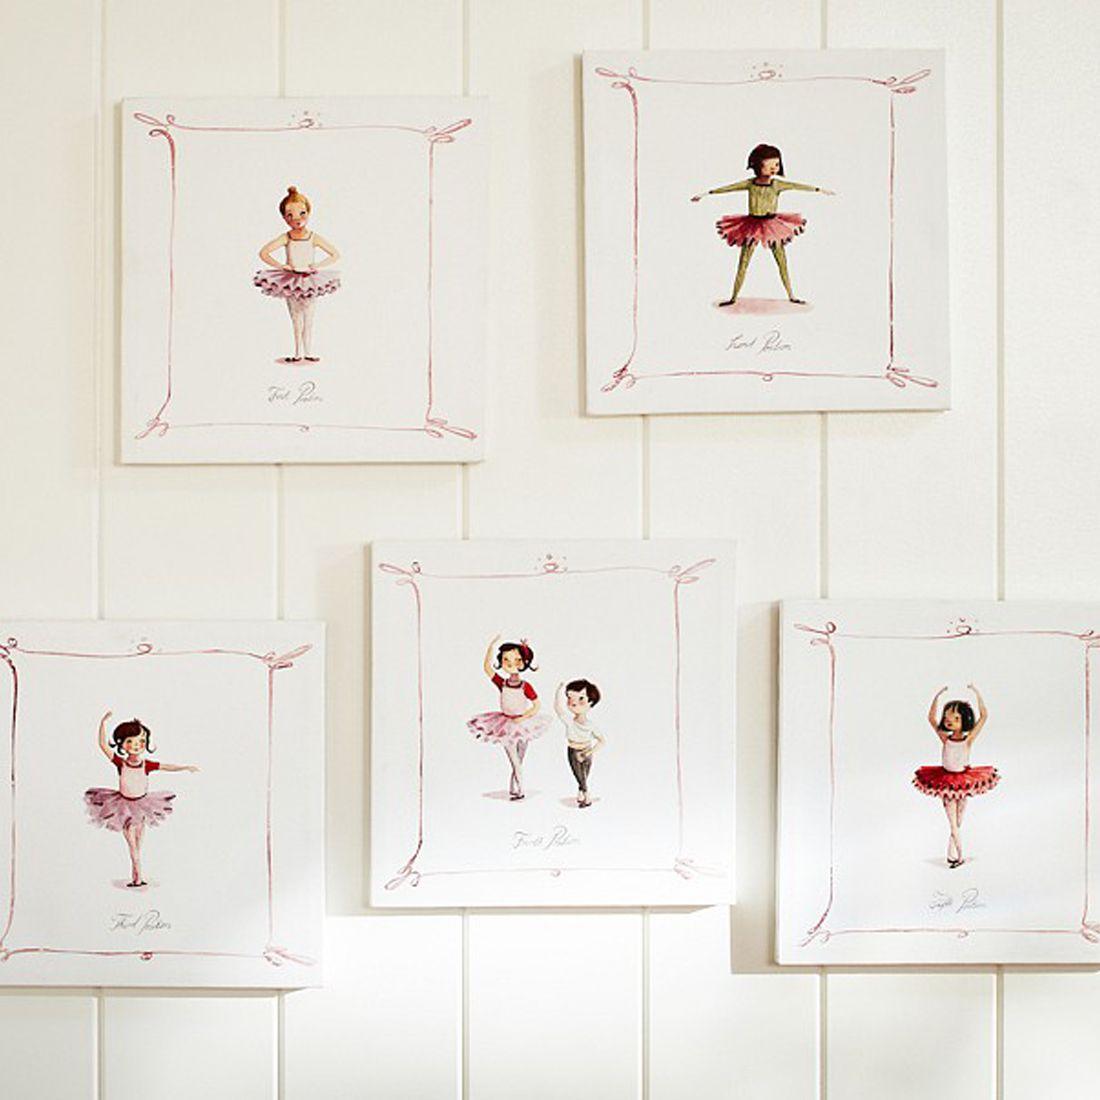 Dainty Room Decor For Your Budding Ballerina